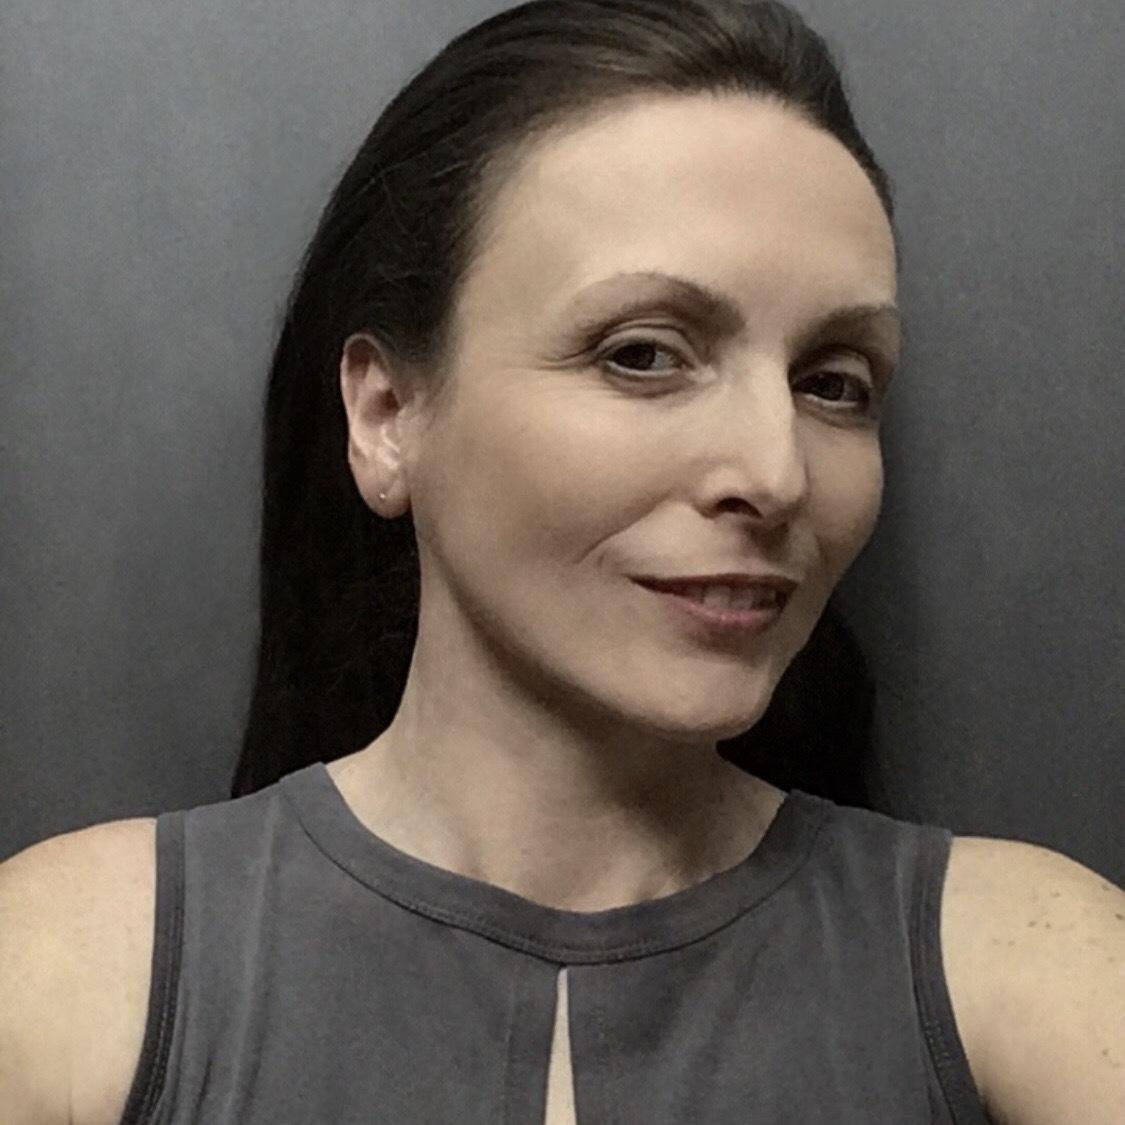 Helen Breznik